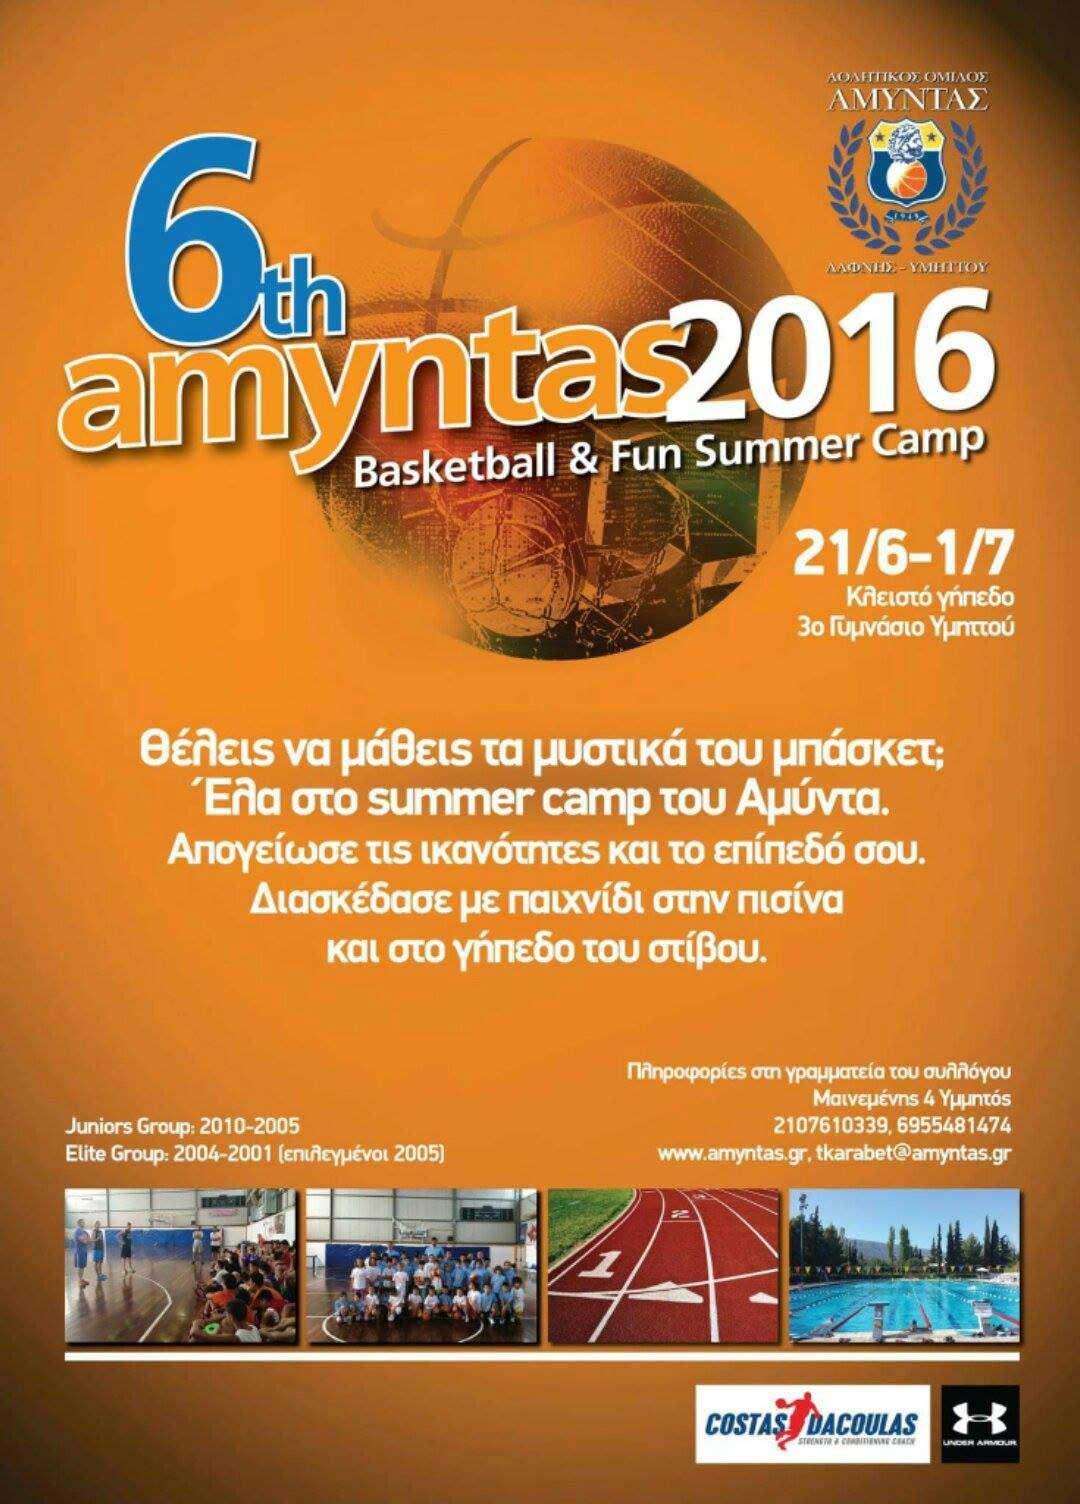 6th-amyntas-summer-camp_b